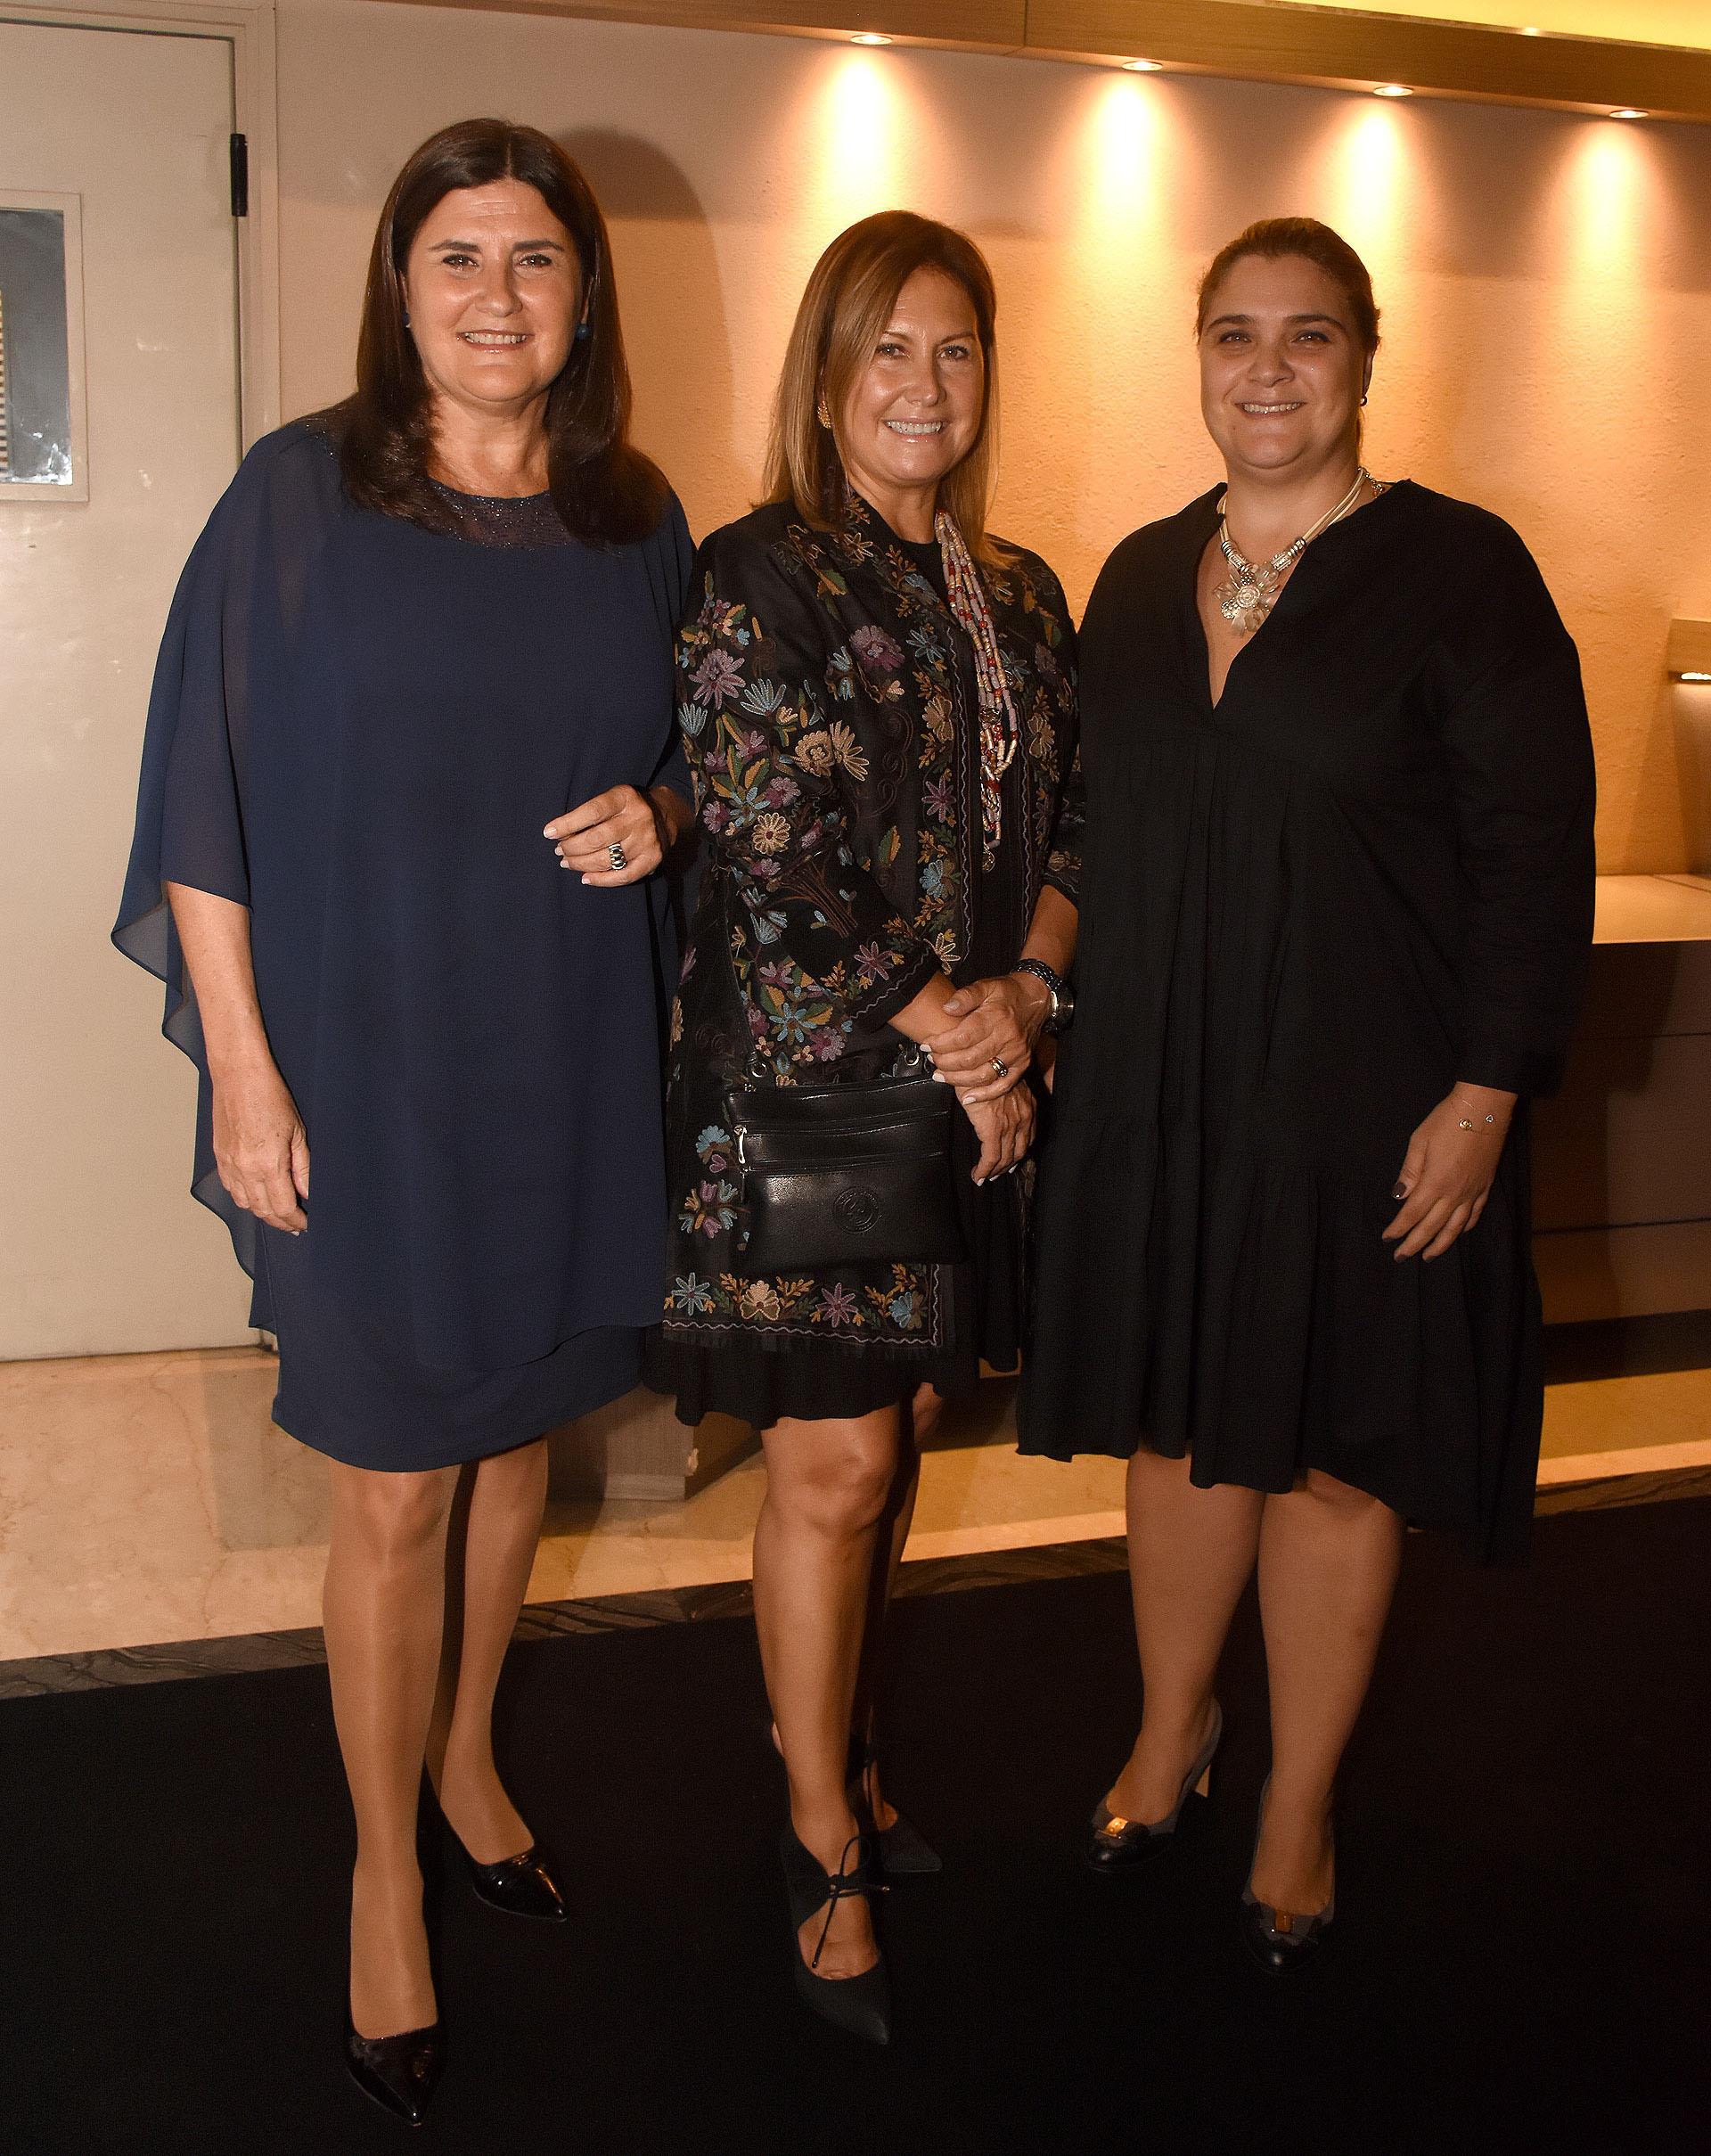 Paula Torres, Lili Monsegou y Marcela Noble Herrera